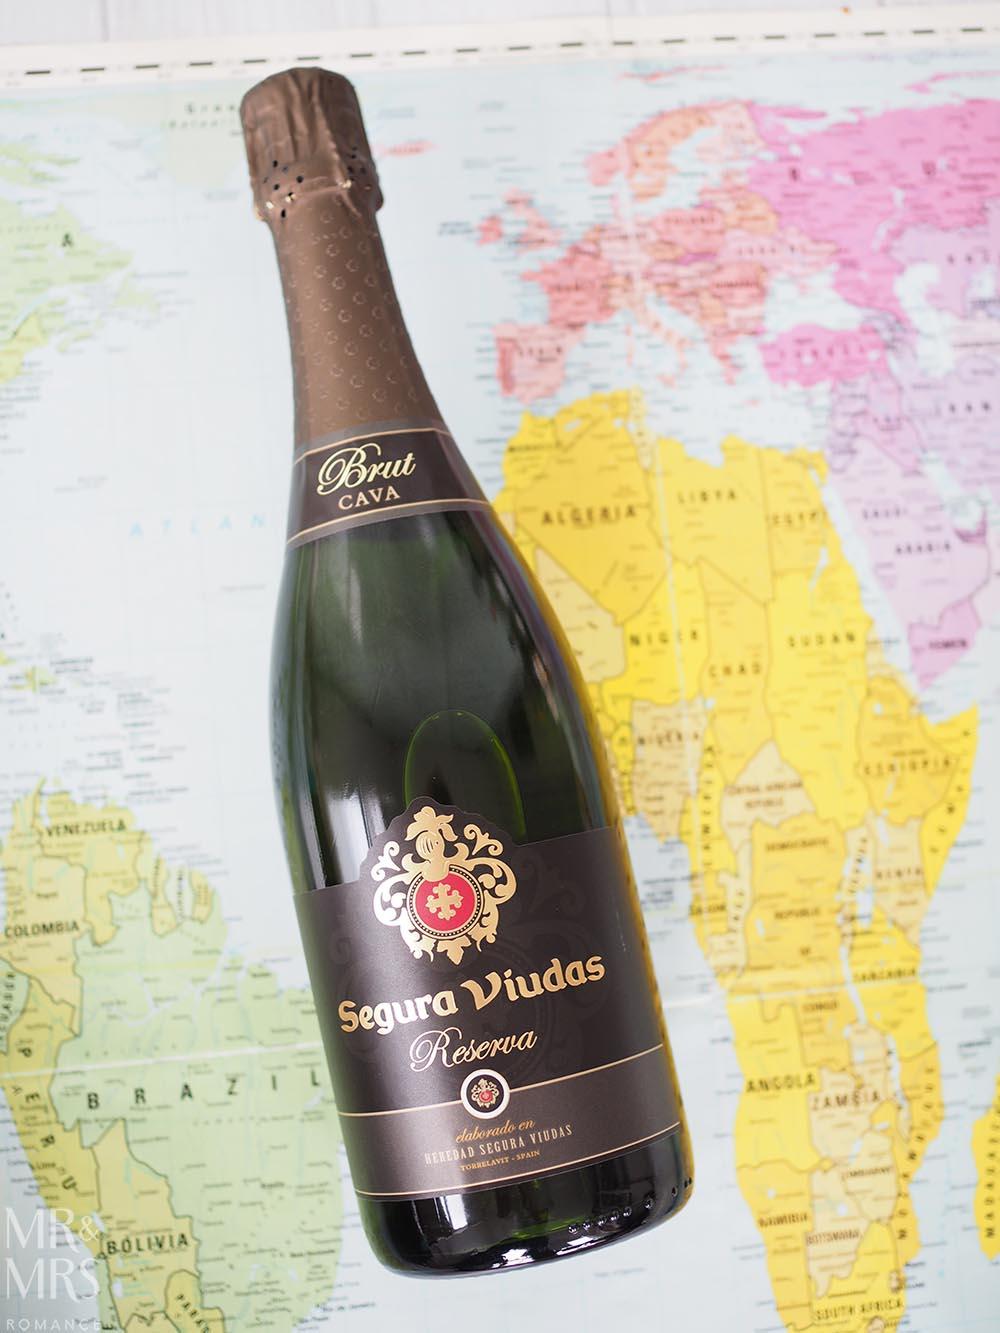 International sparkling wine - Segura Viunas - Mr and Mrs Romance